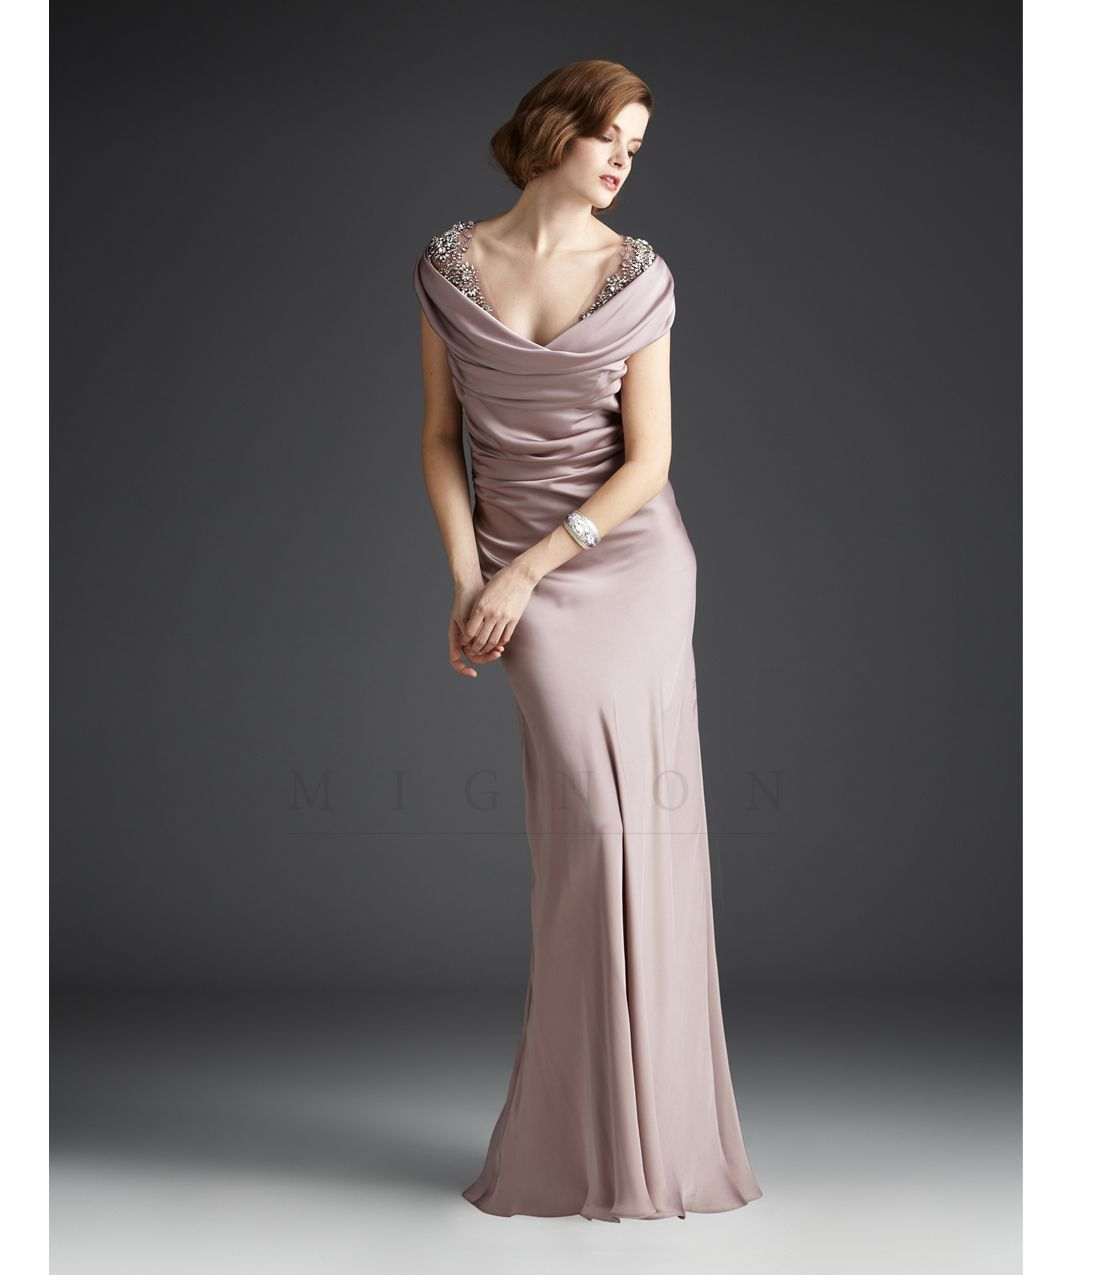 b9ec7d1e5d Mignon Fall 2013- Quartz Embellished Draped Gown - Unique Vintage - Prom  dresses